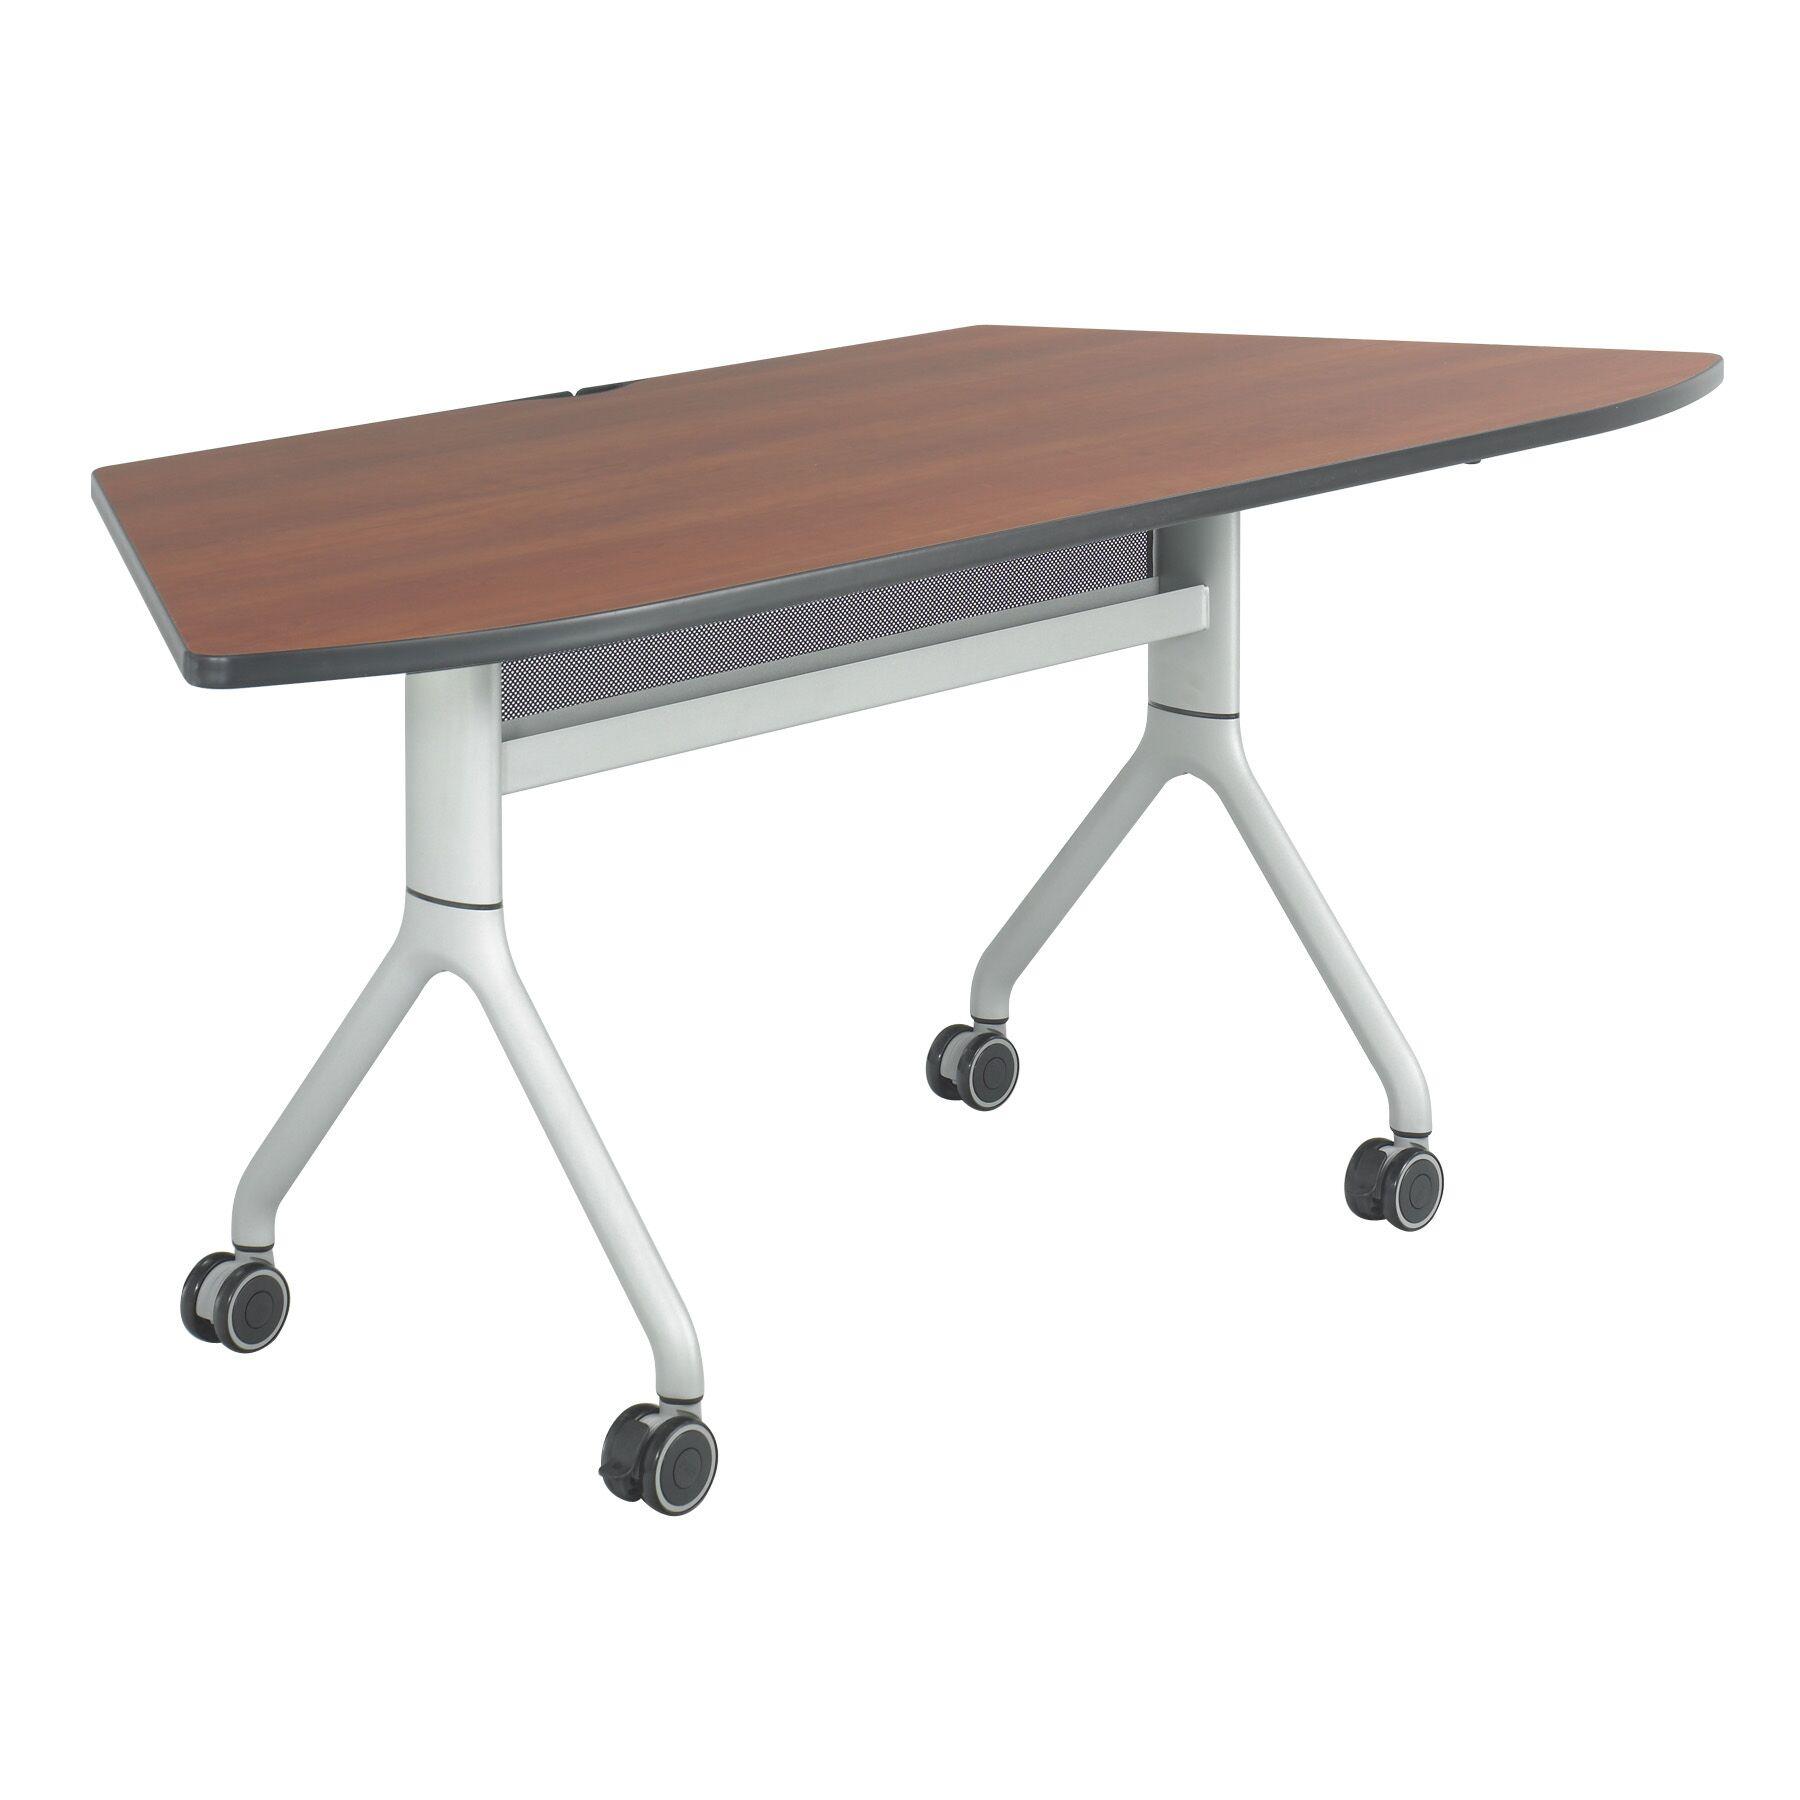 Rumba Training Table with Wheels Base Finish: Metallic Gray, Tabletop Finish: Gray, Size: 60 x 24